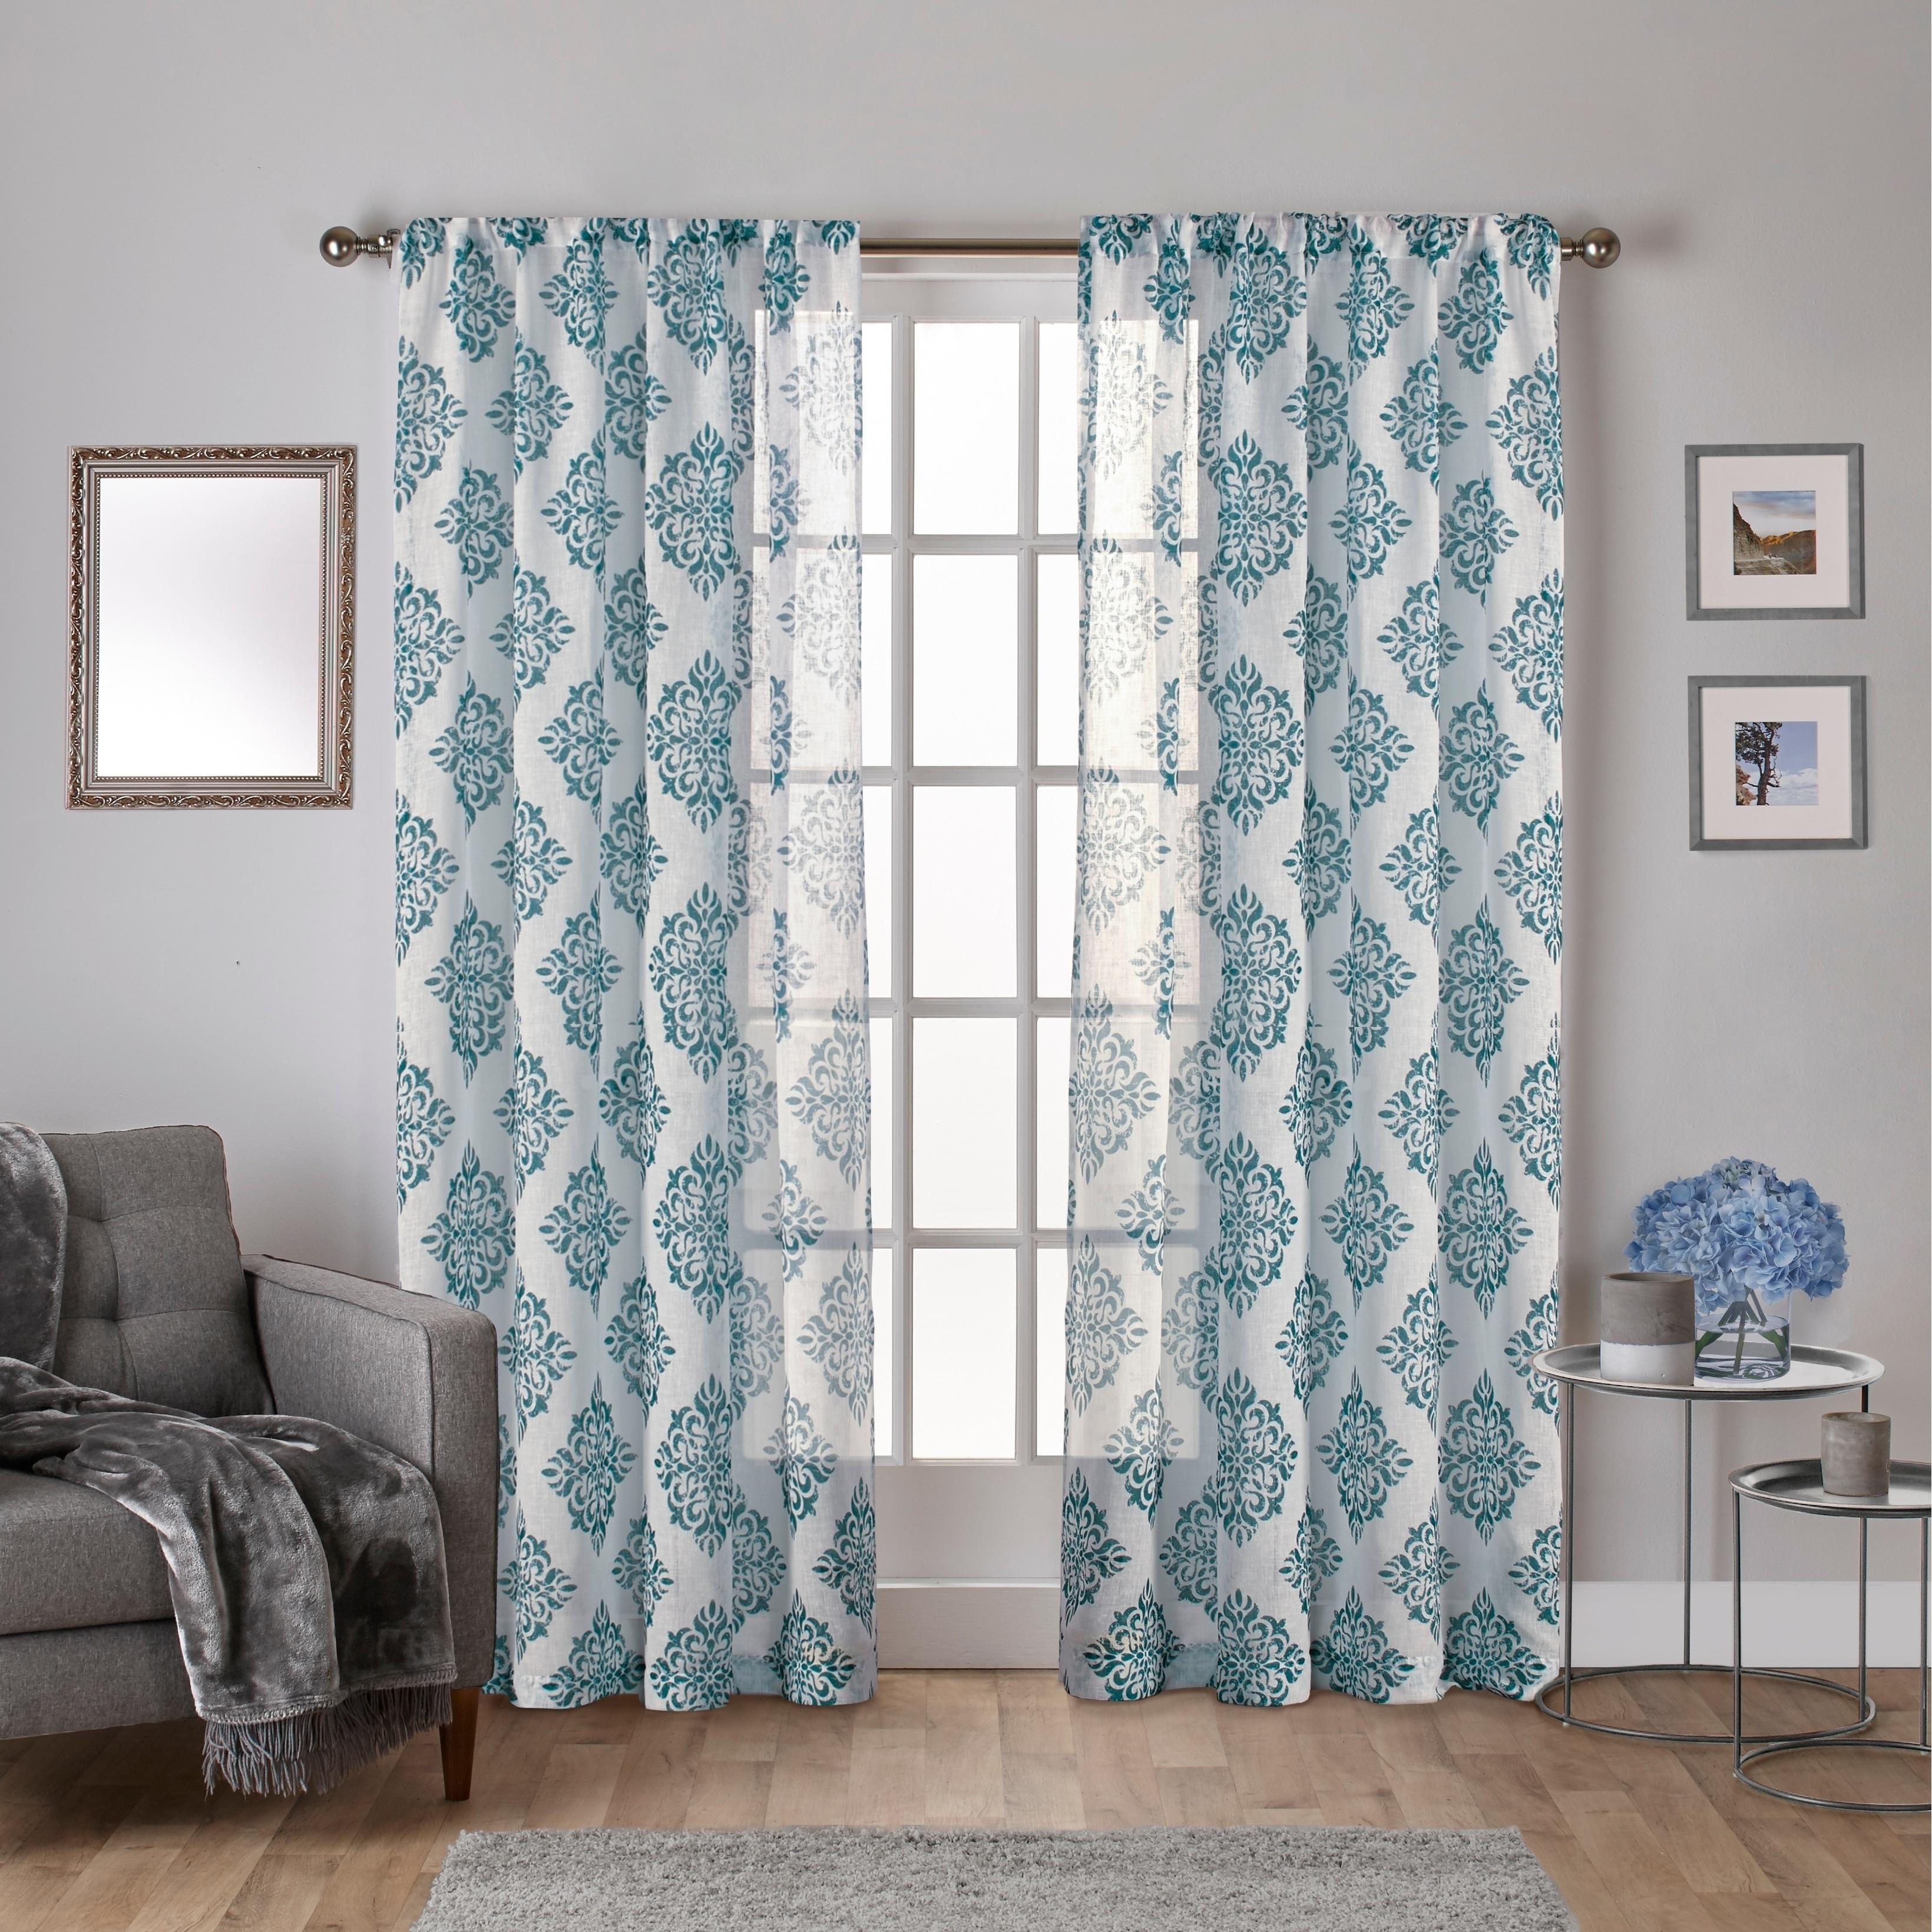 Shop ATI Home Nagano Belgian Linen Sheer Rod Pocket Top Curtain ...